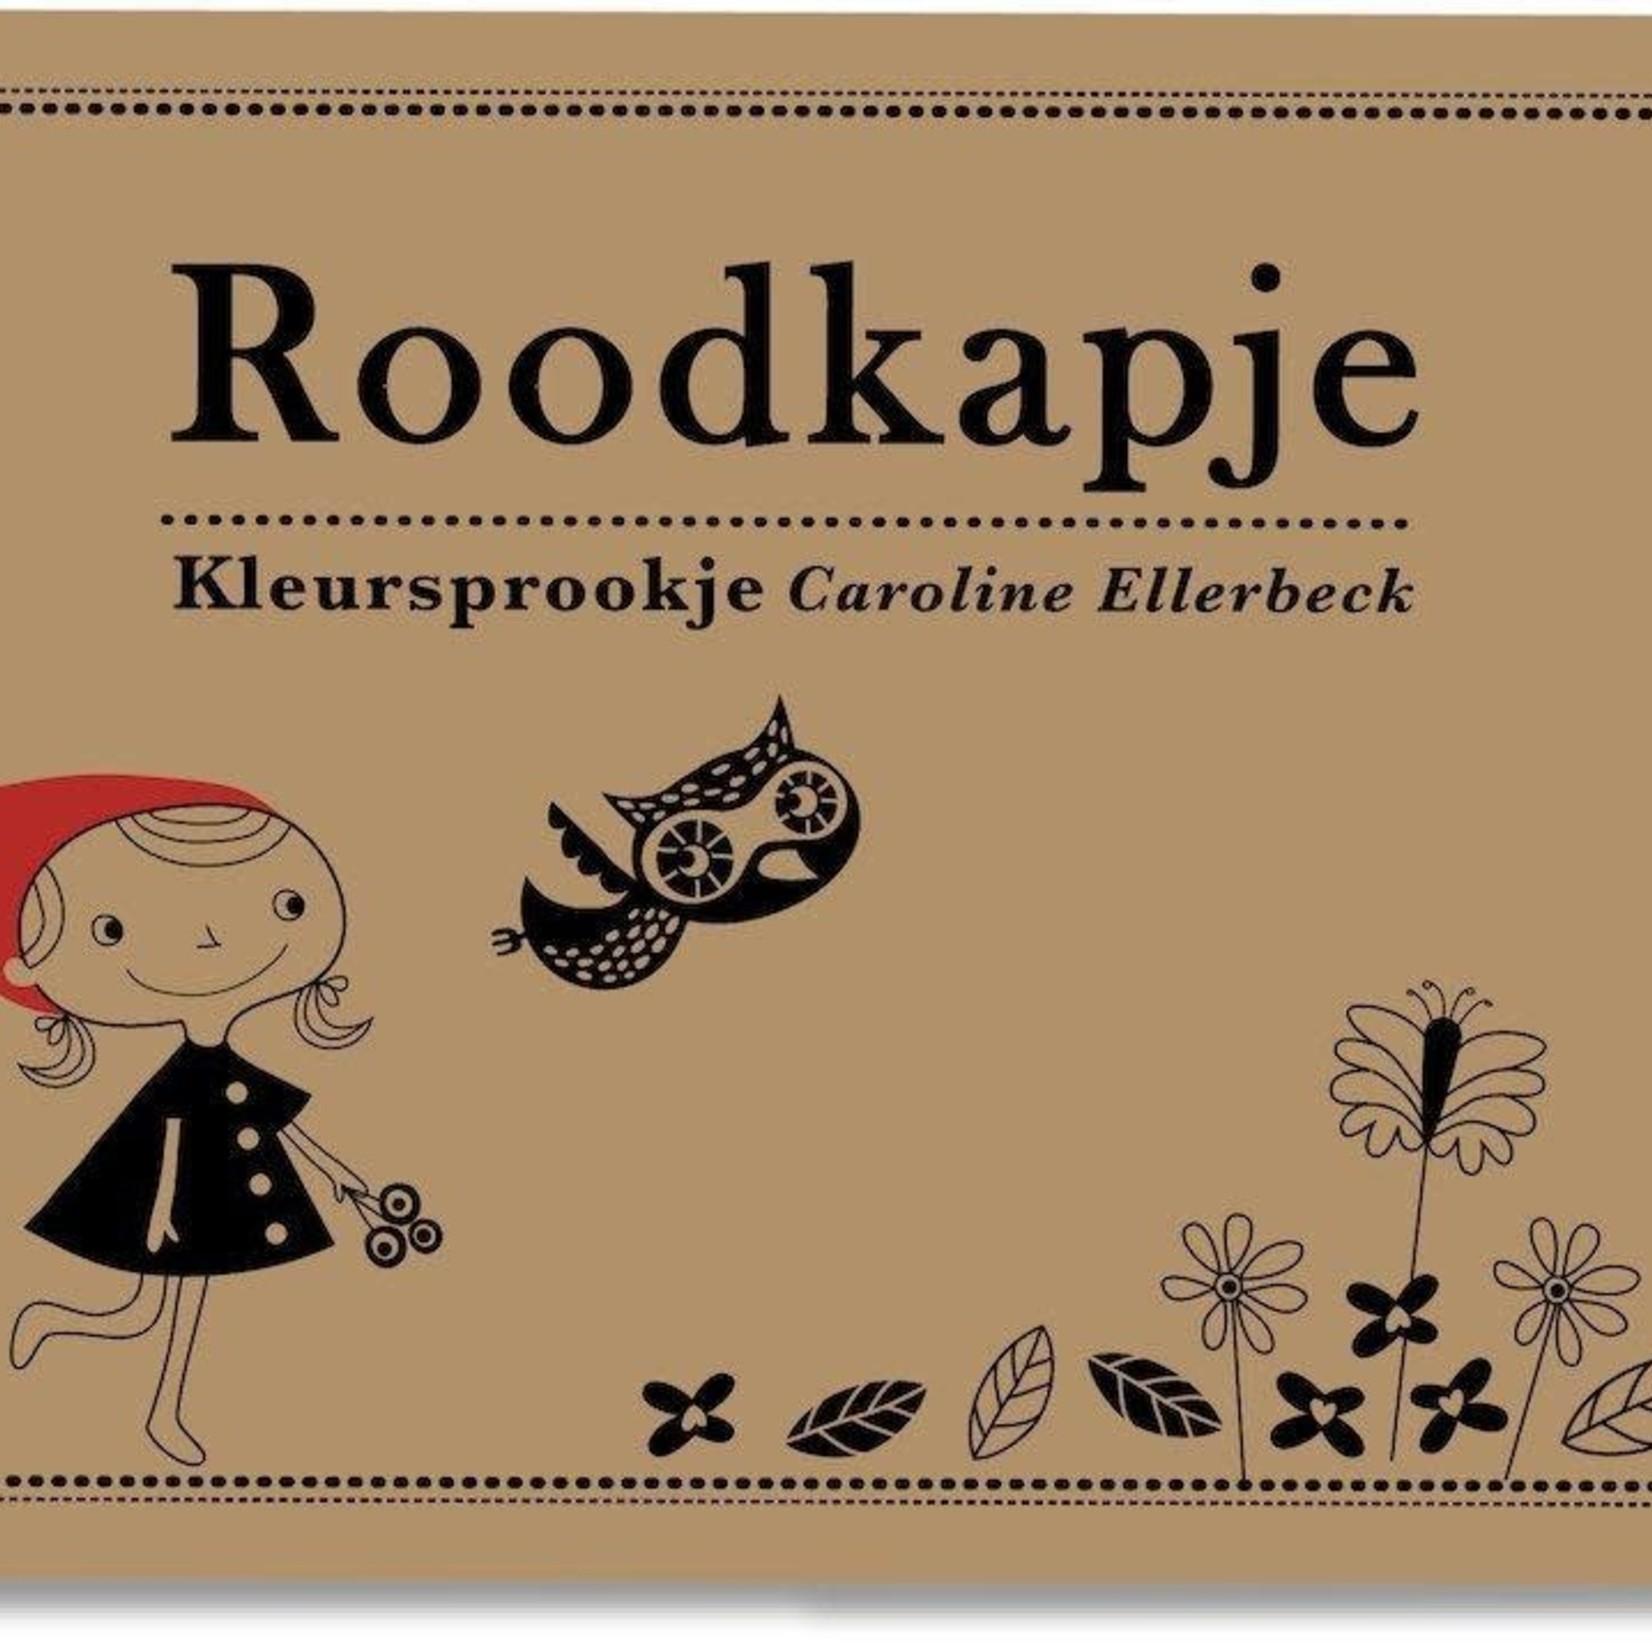 Caroline Ellerbeck Kleursprookje